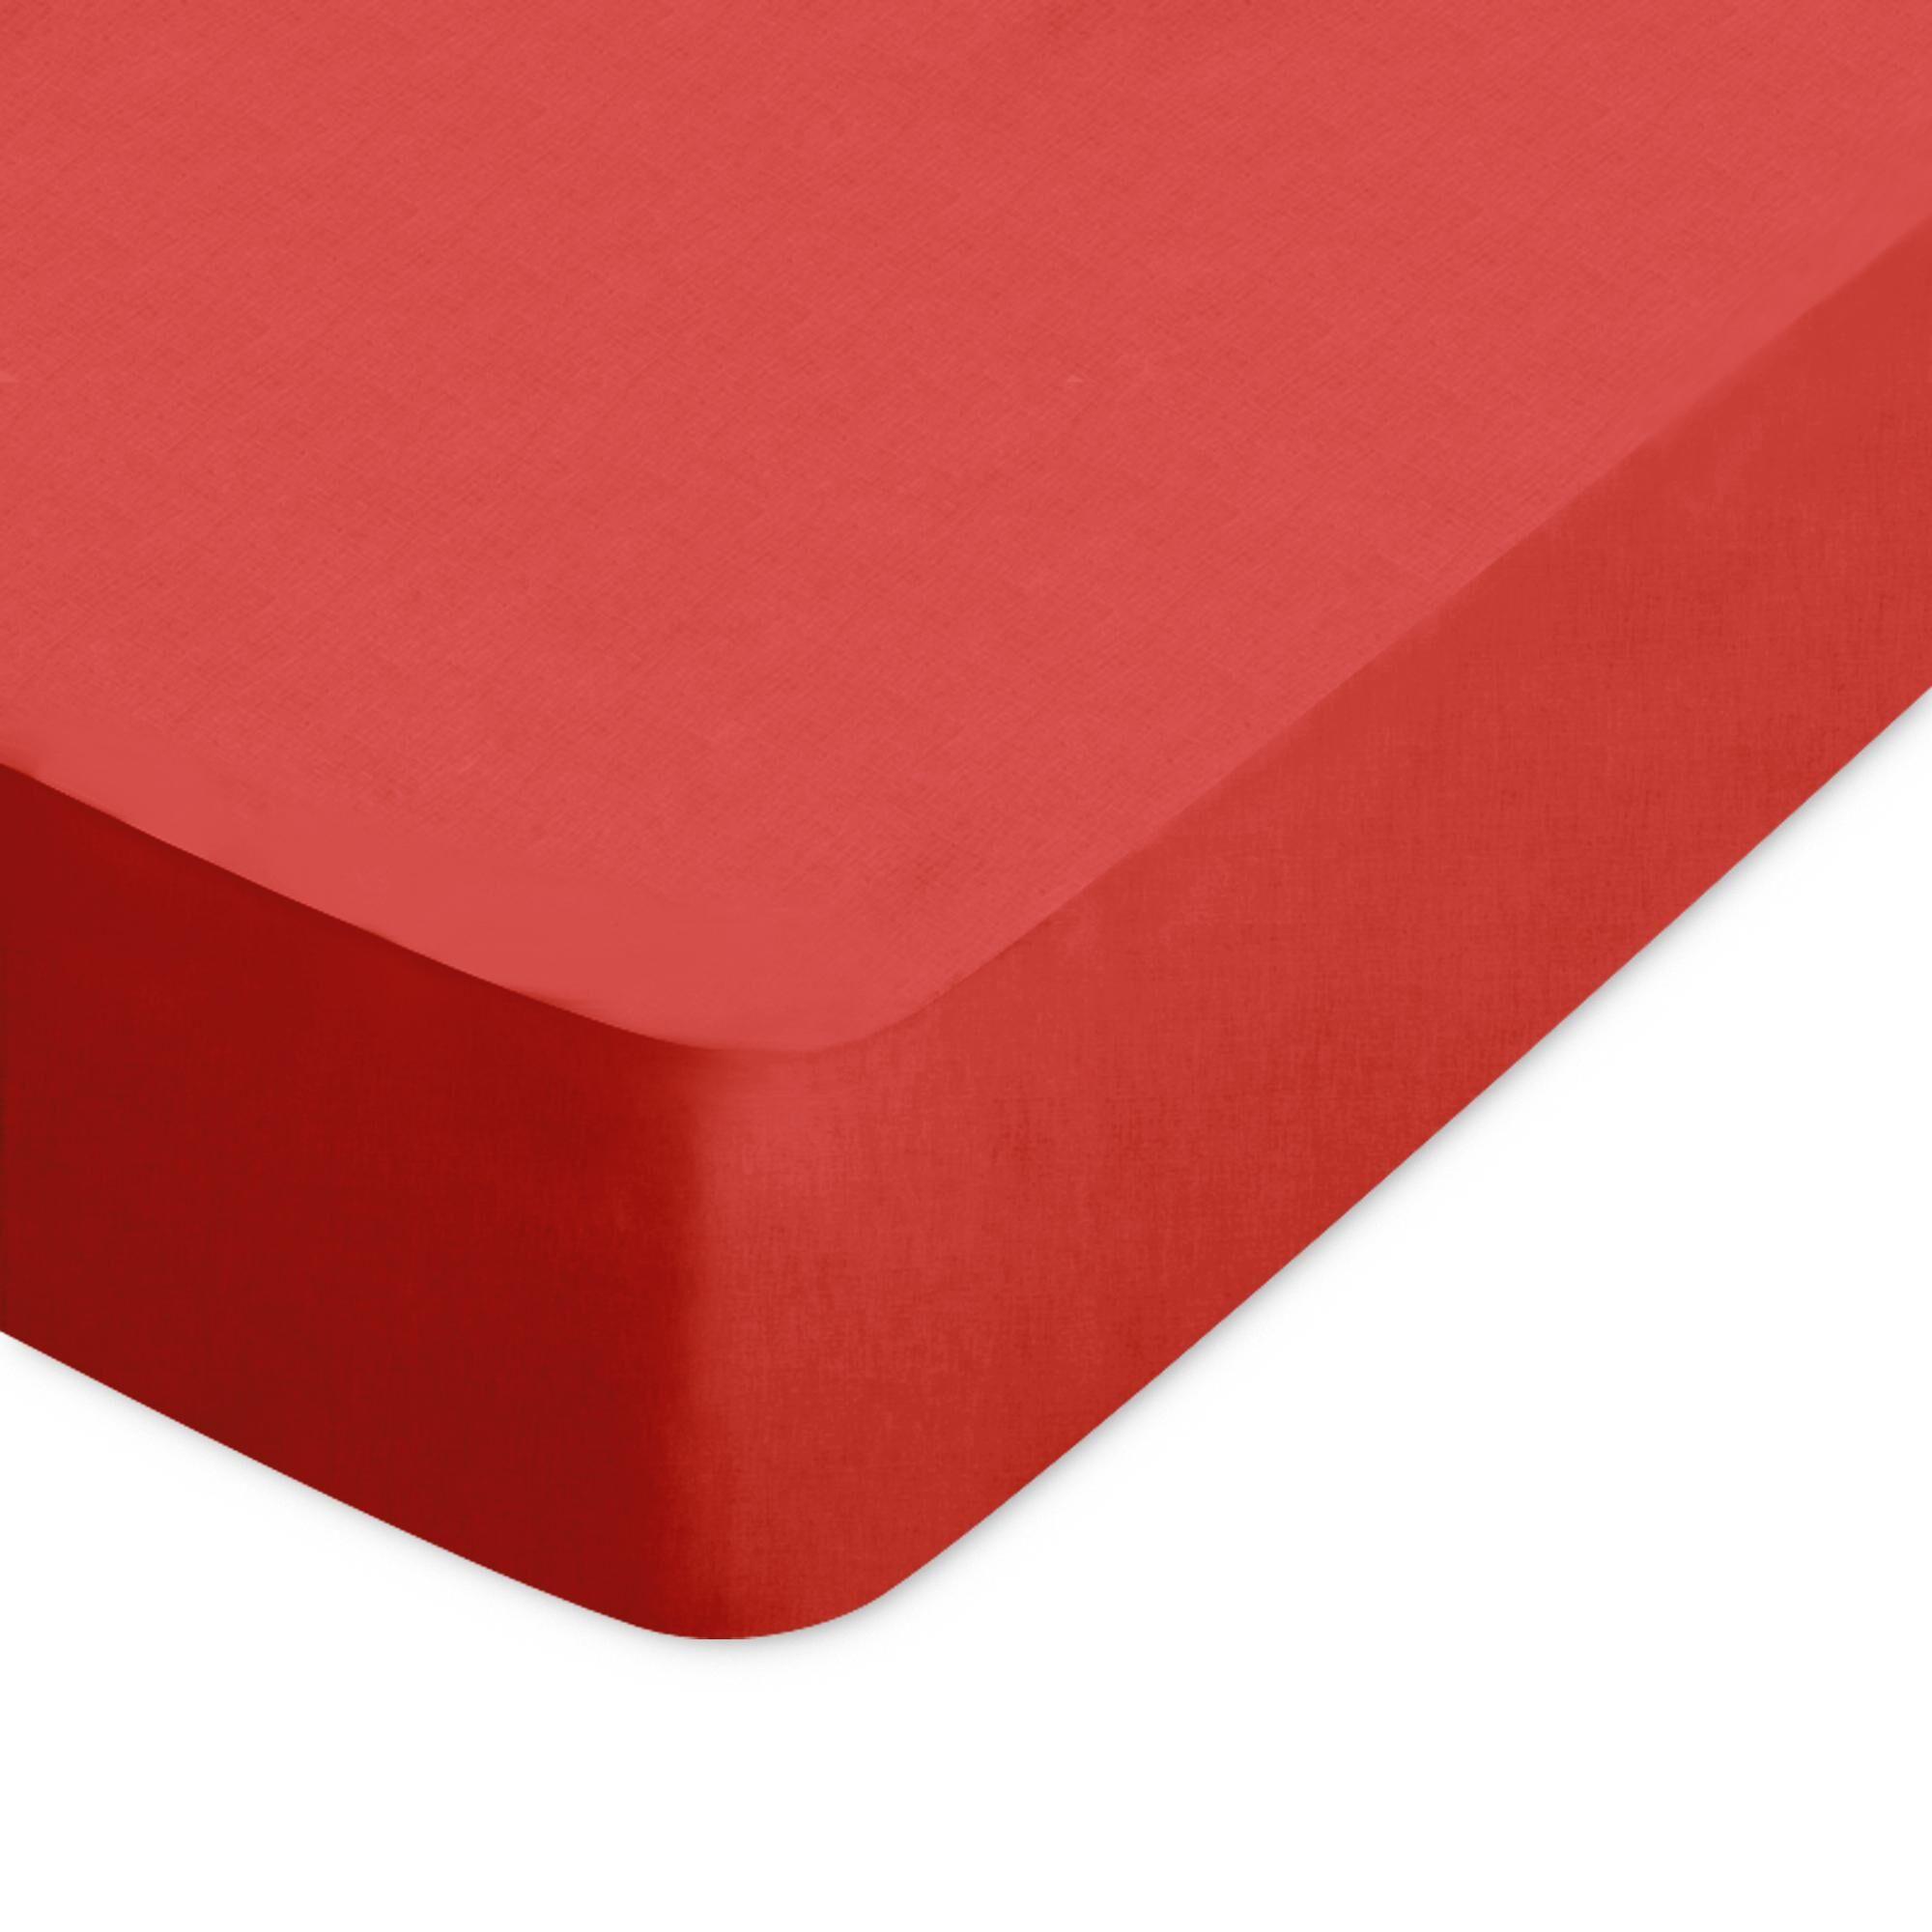 Linnea Drap housse uni 150x190 cm 100% coton ALTO orange Baie de Goji